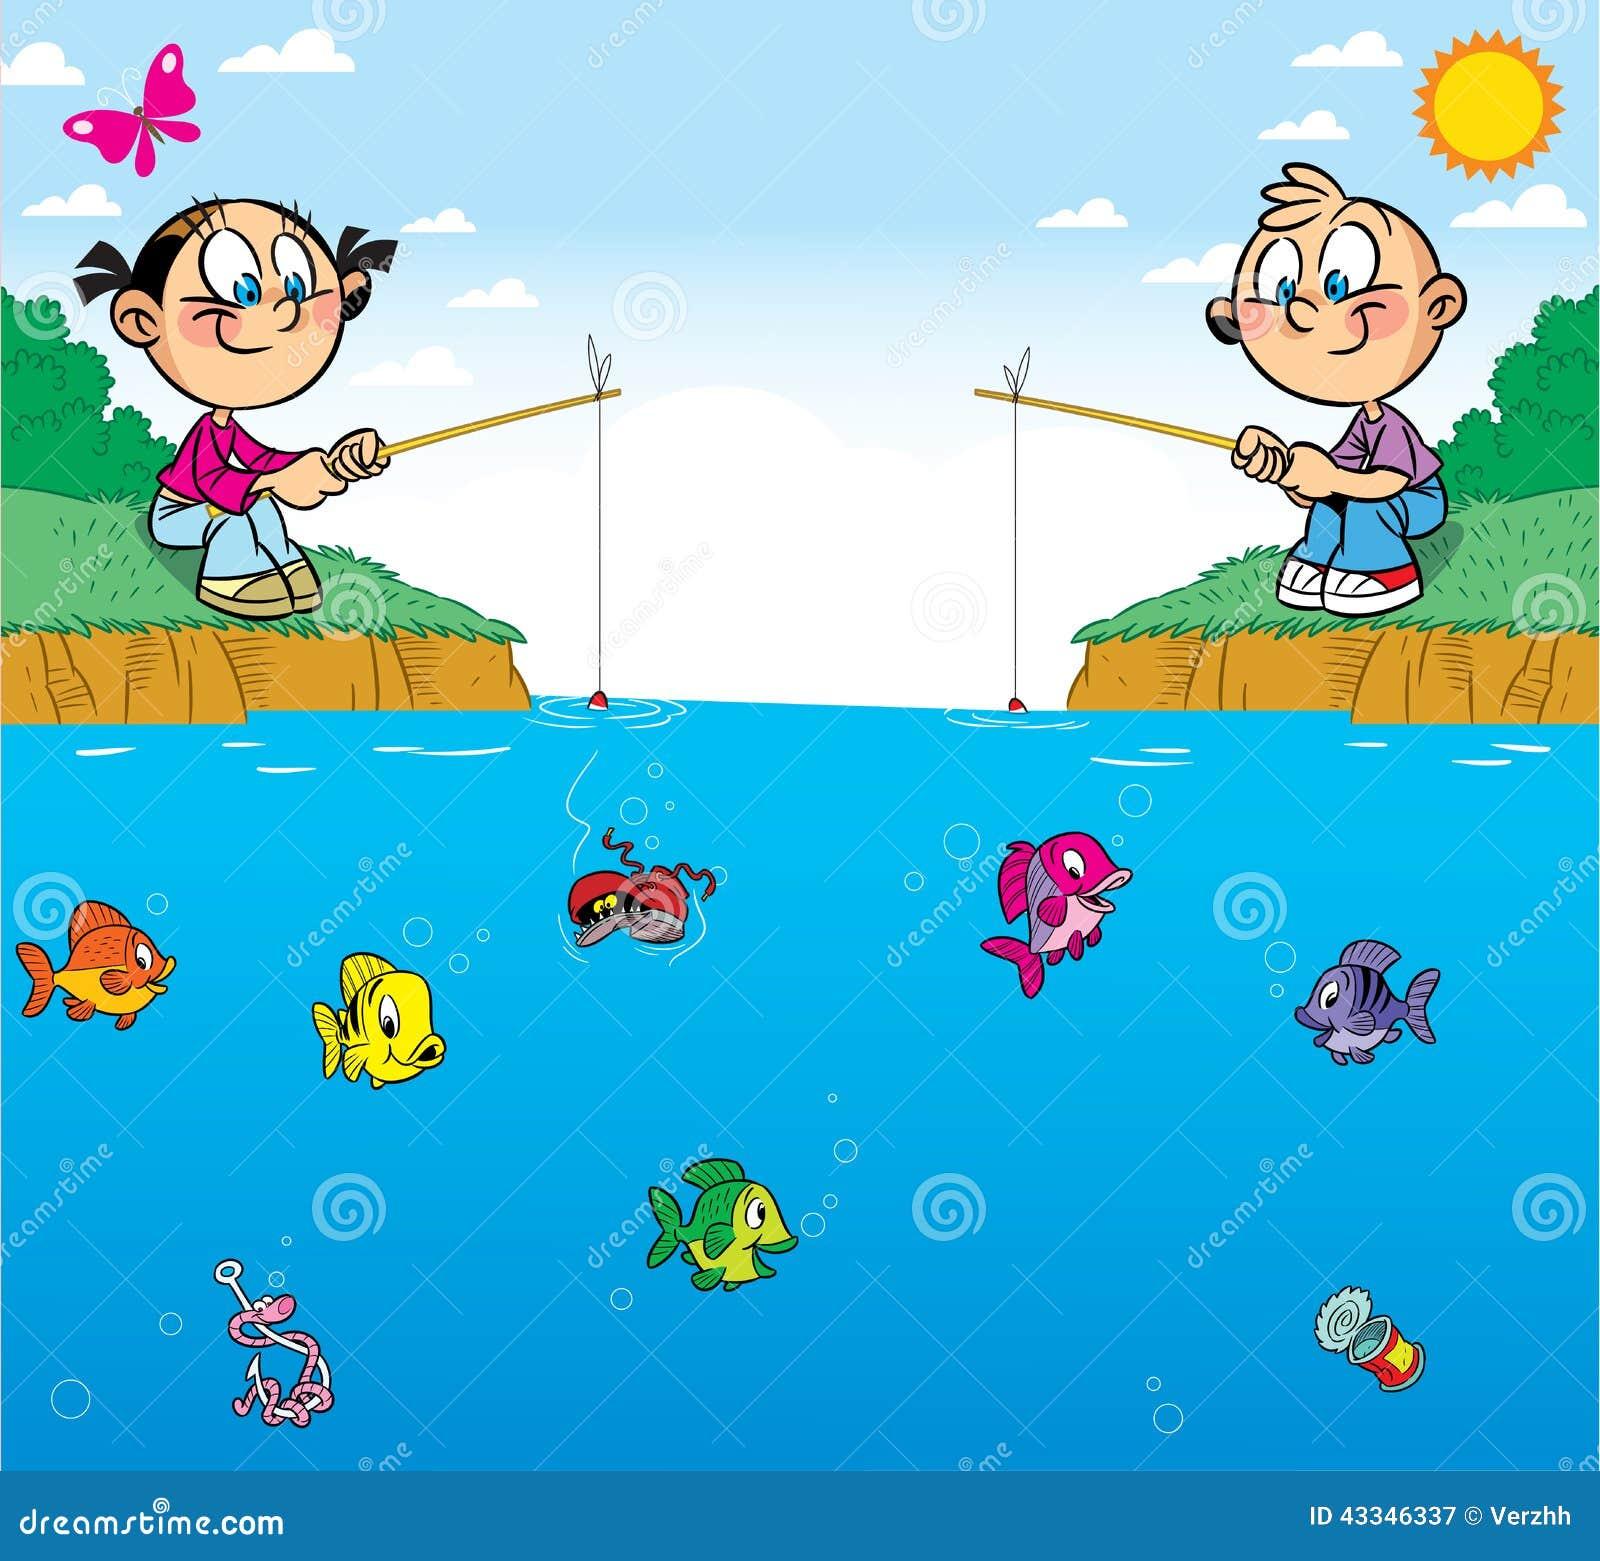 Children On Fishing Stock Vector - Image: 43346337